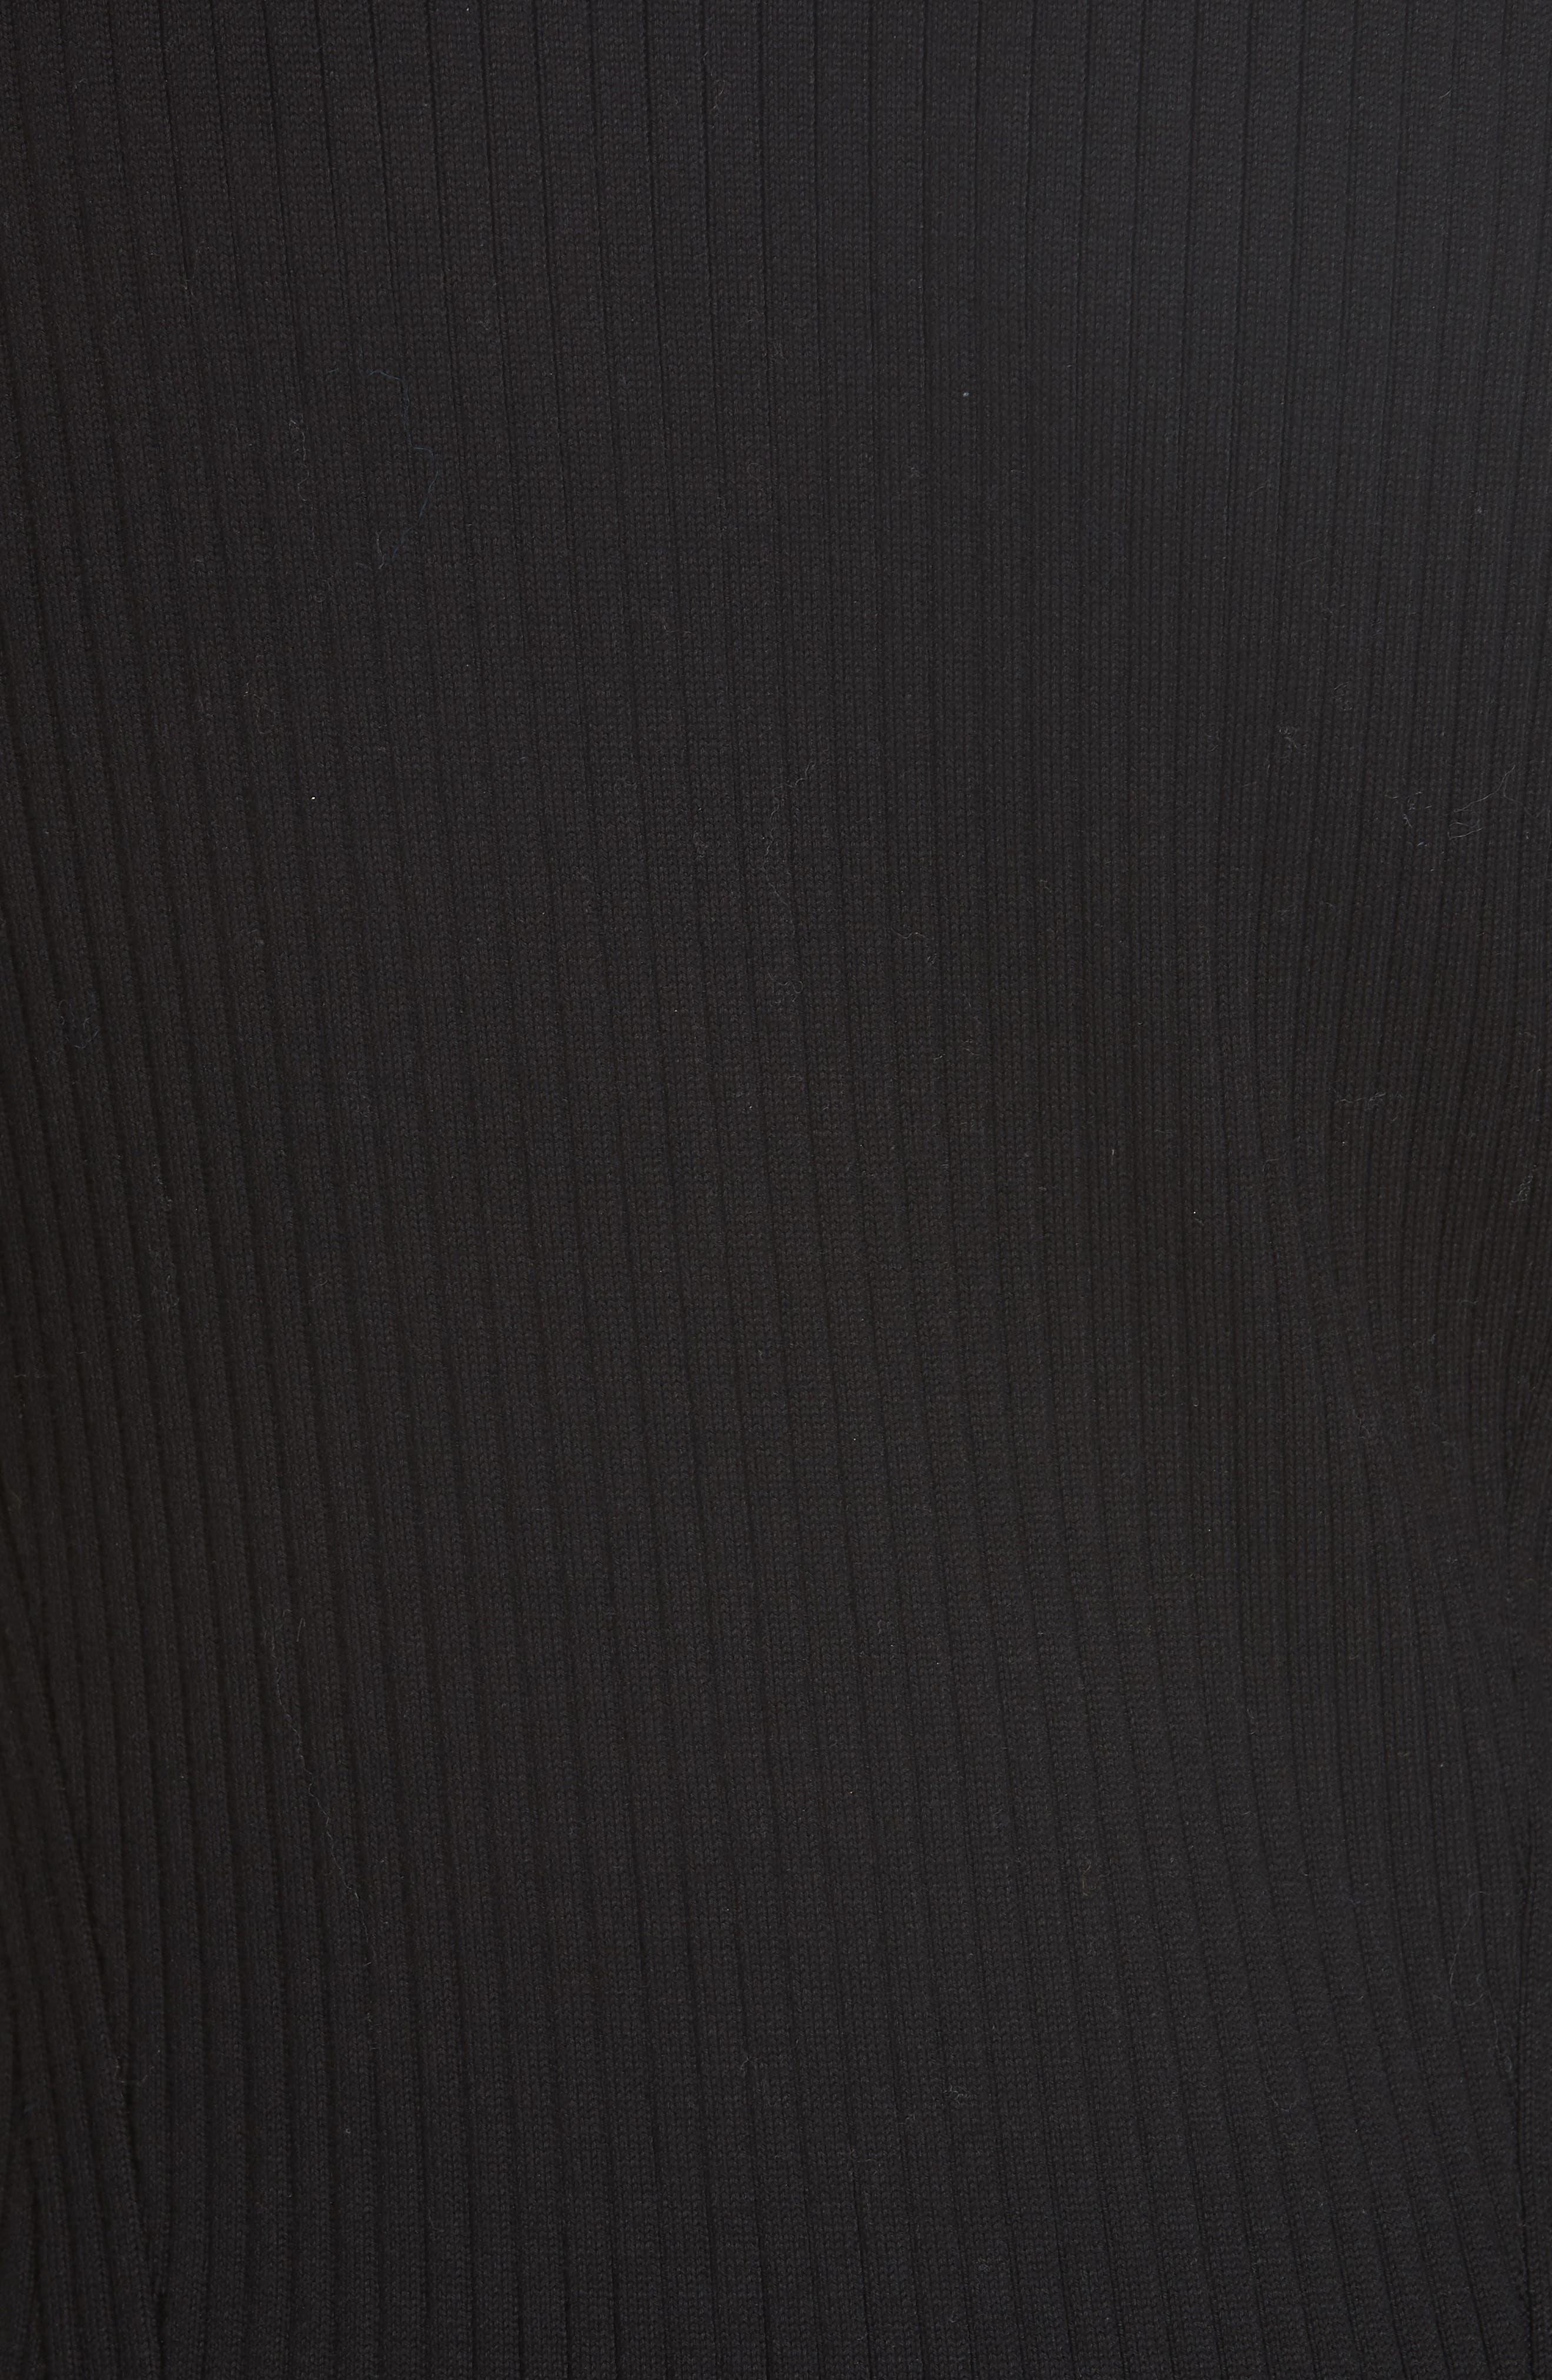 RAG & BONE,                             Brynn Rib Knit Dress,                             Alternate thumbnail 6, color,                             BLACK